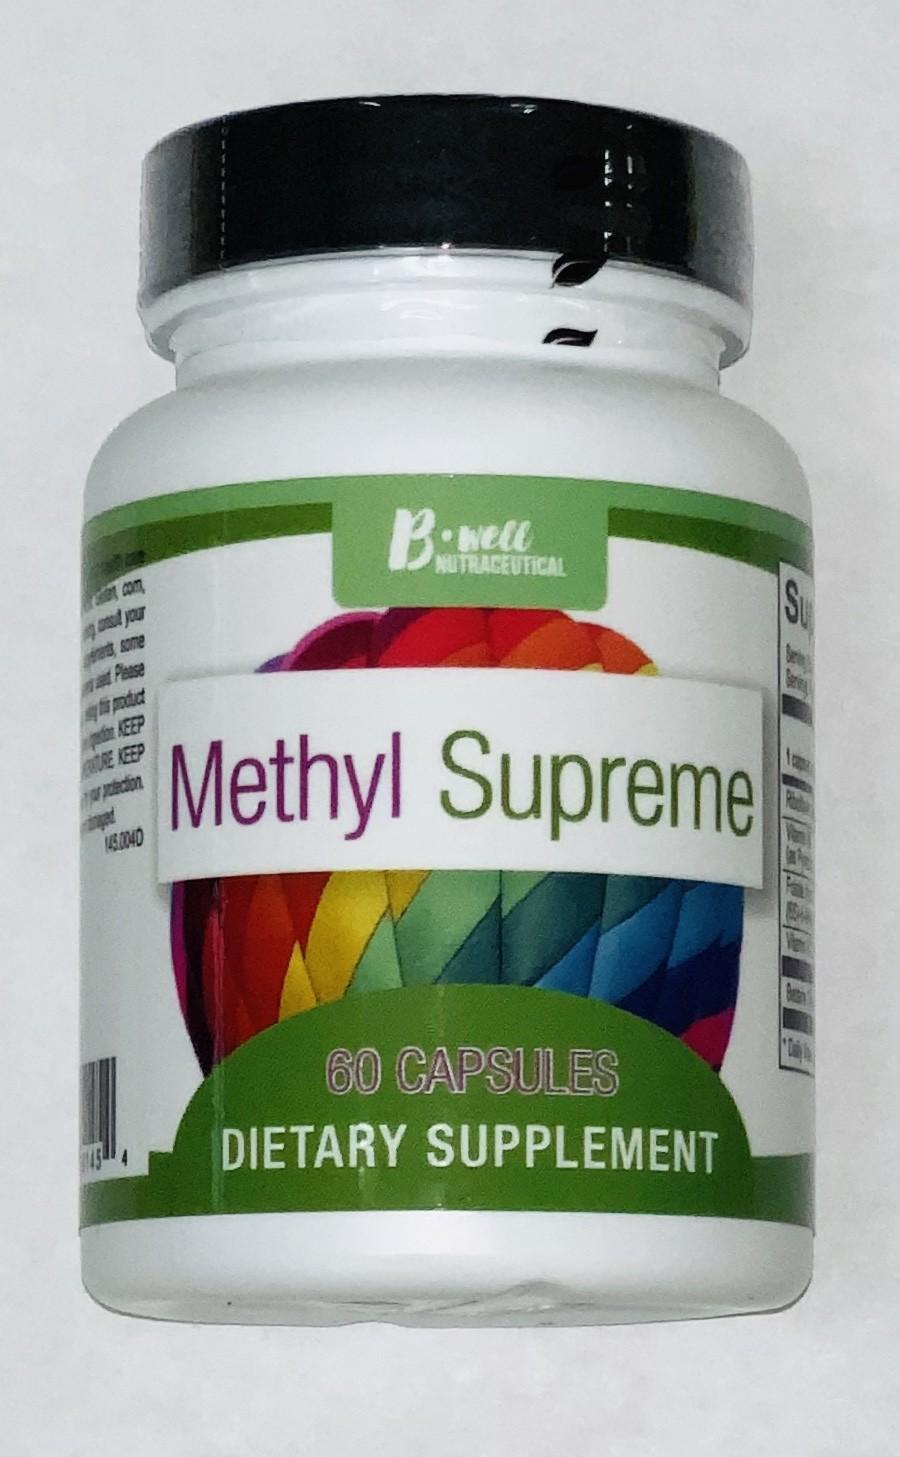 Methyl Supreme